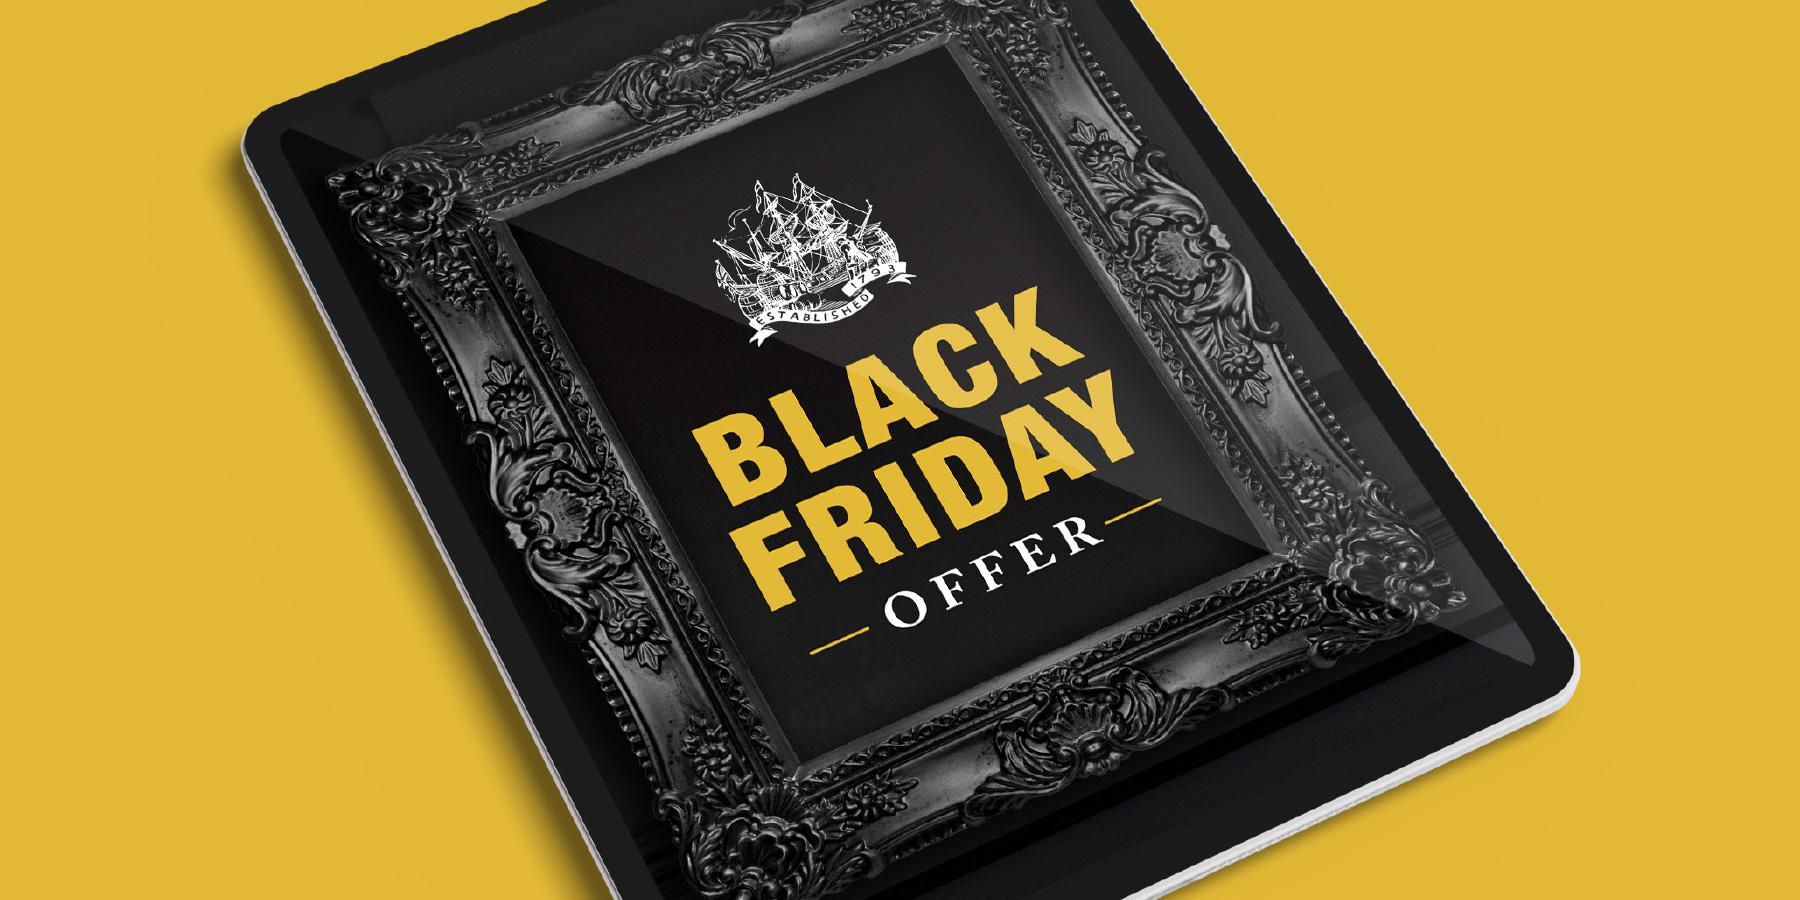 Averys - Black Friday Campaign